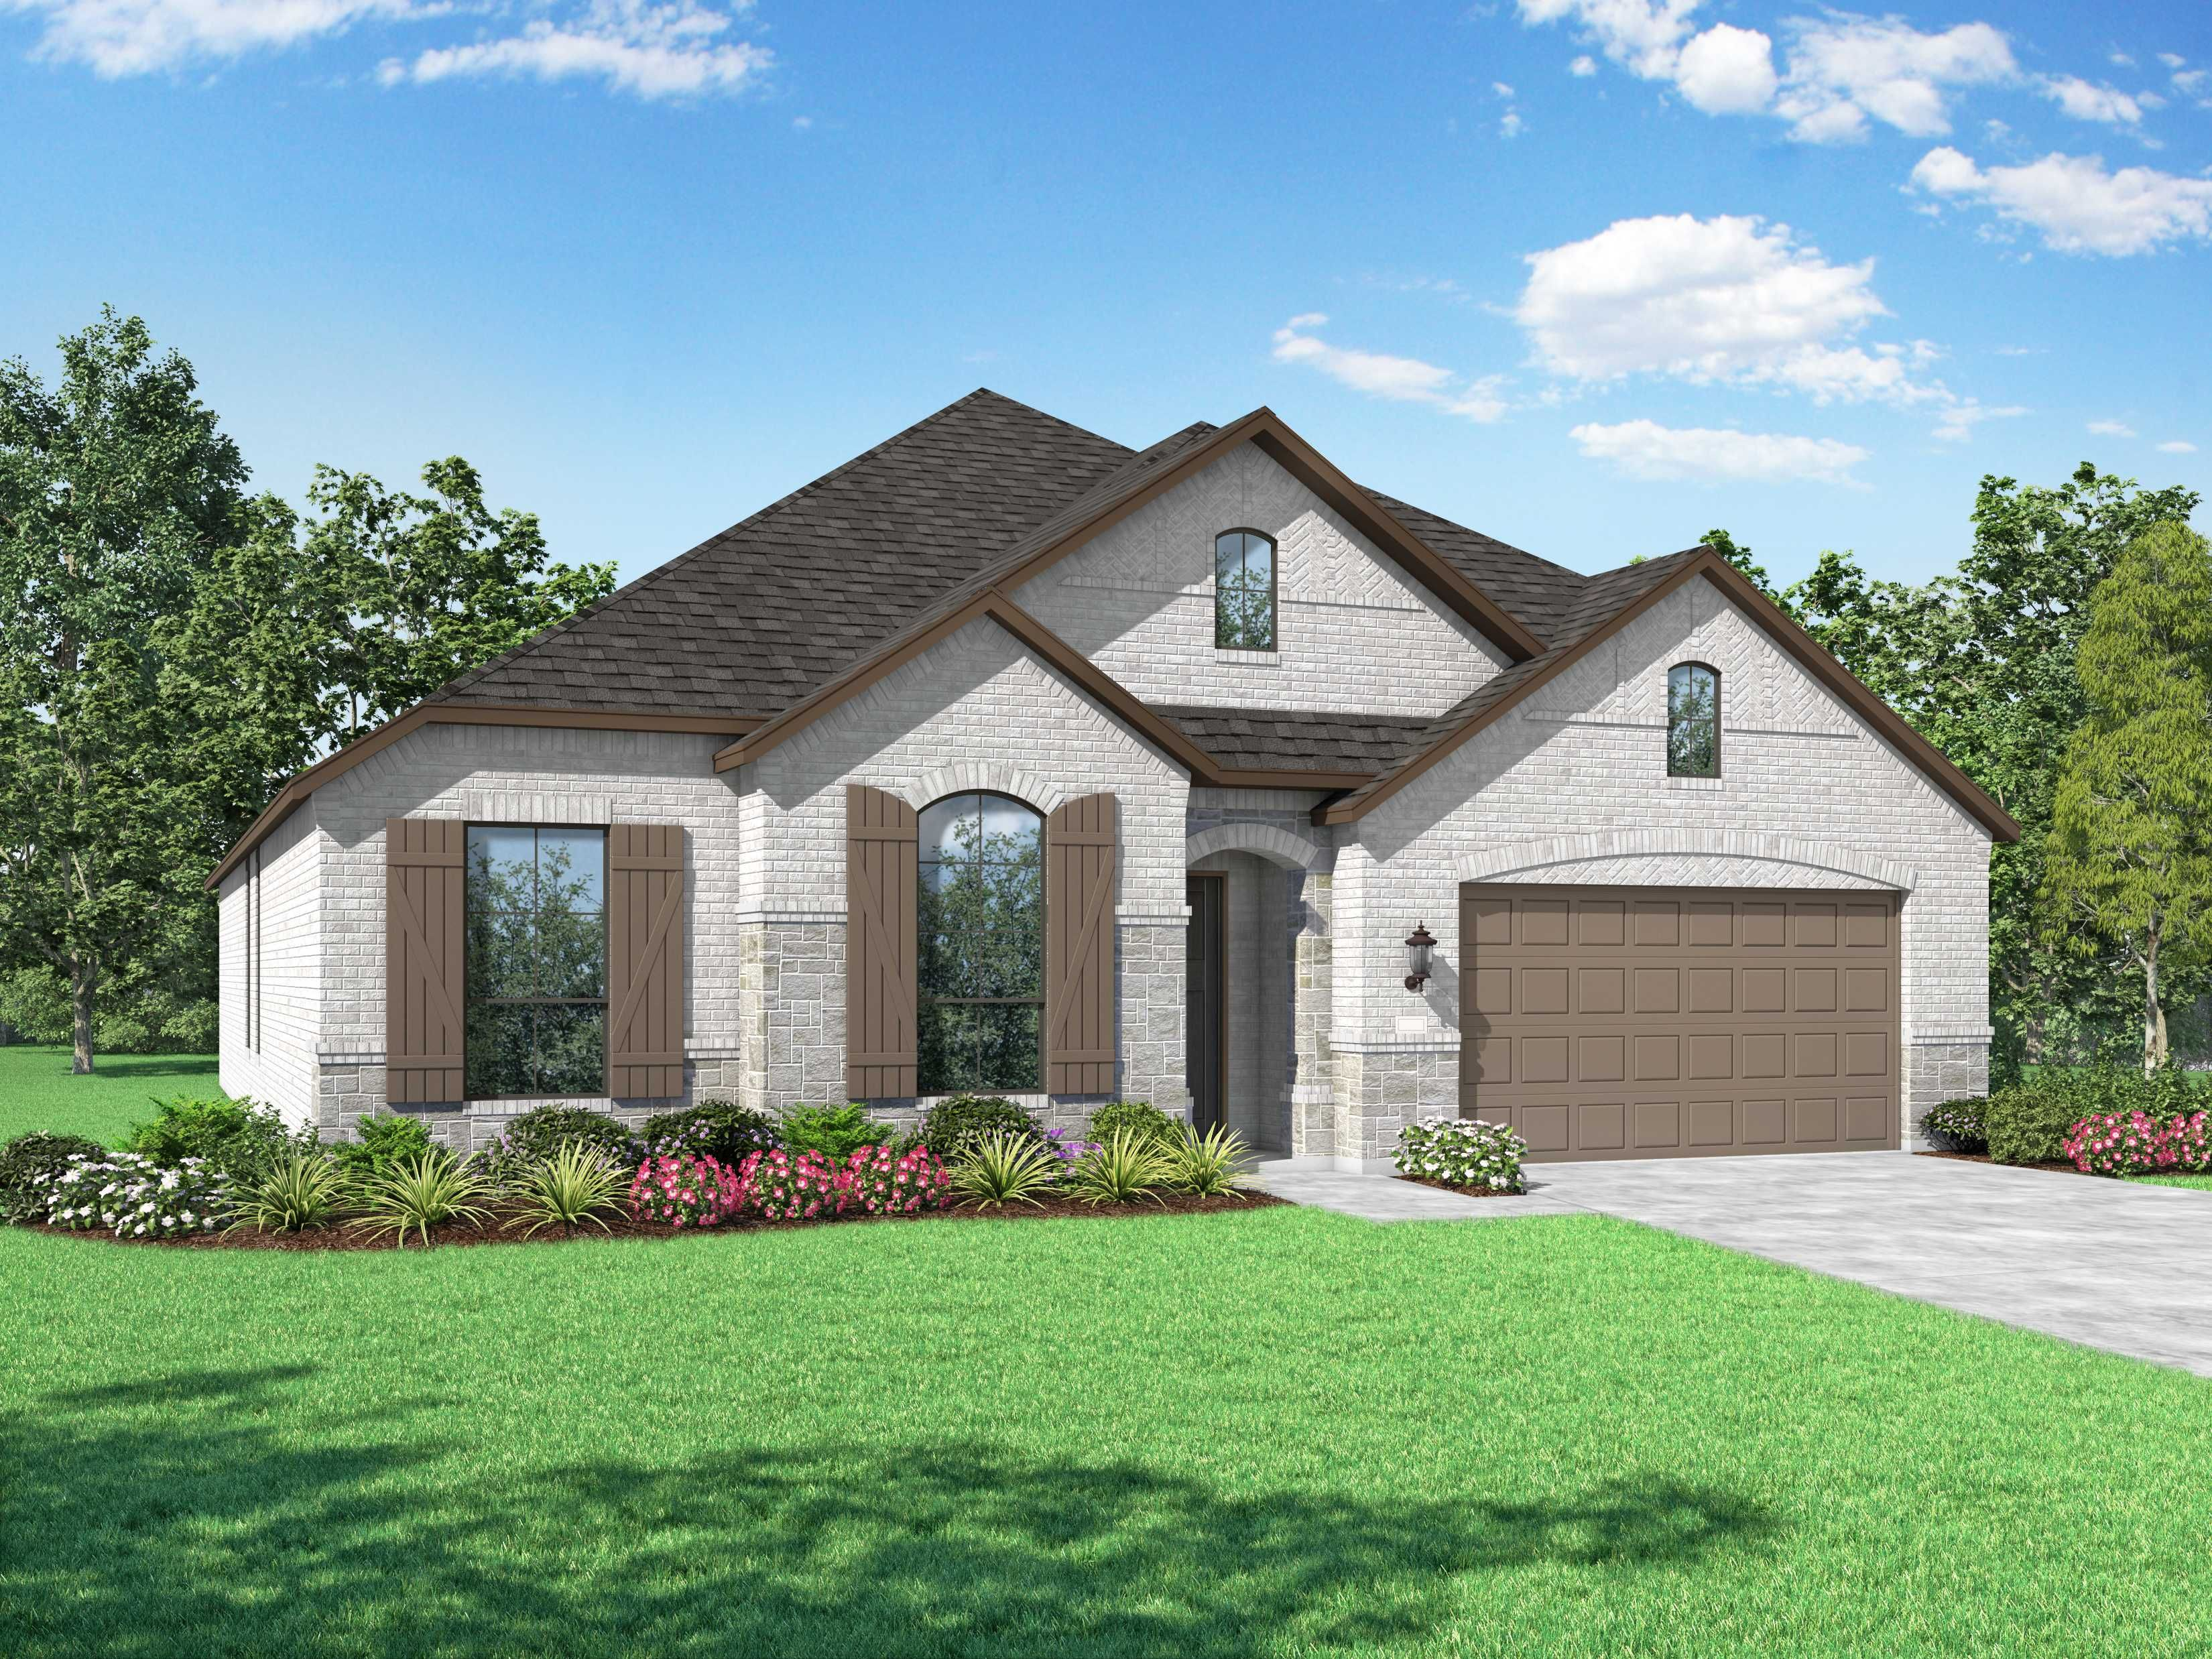 New Home munity Information ARTAVIA Conroe Texas